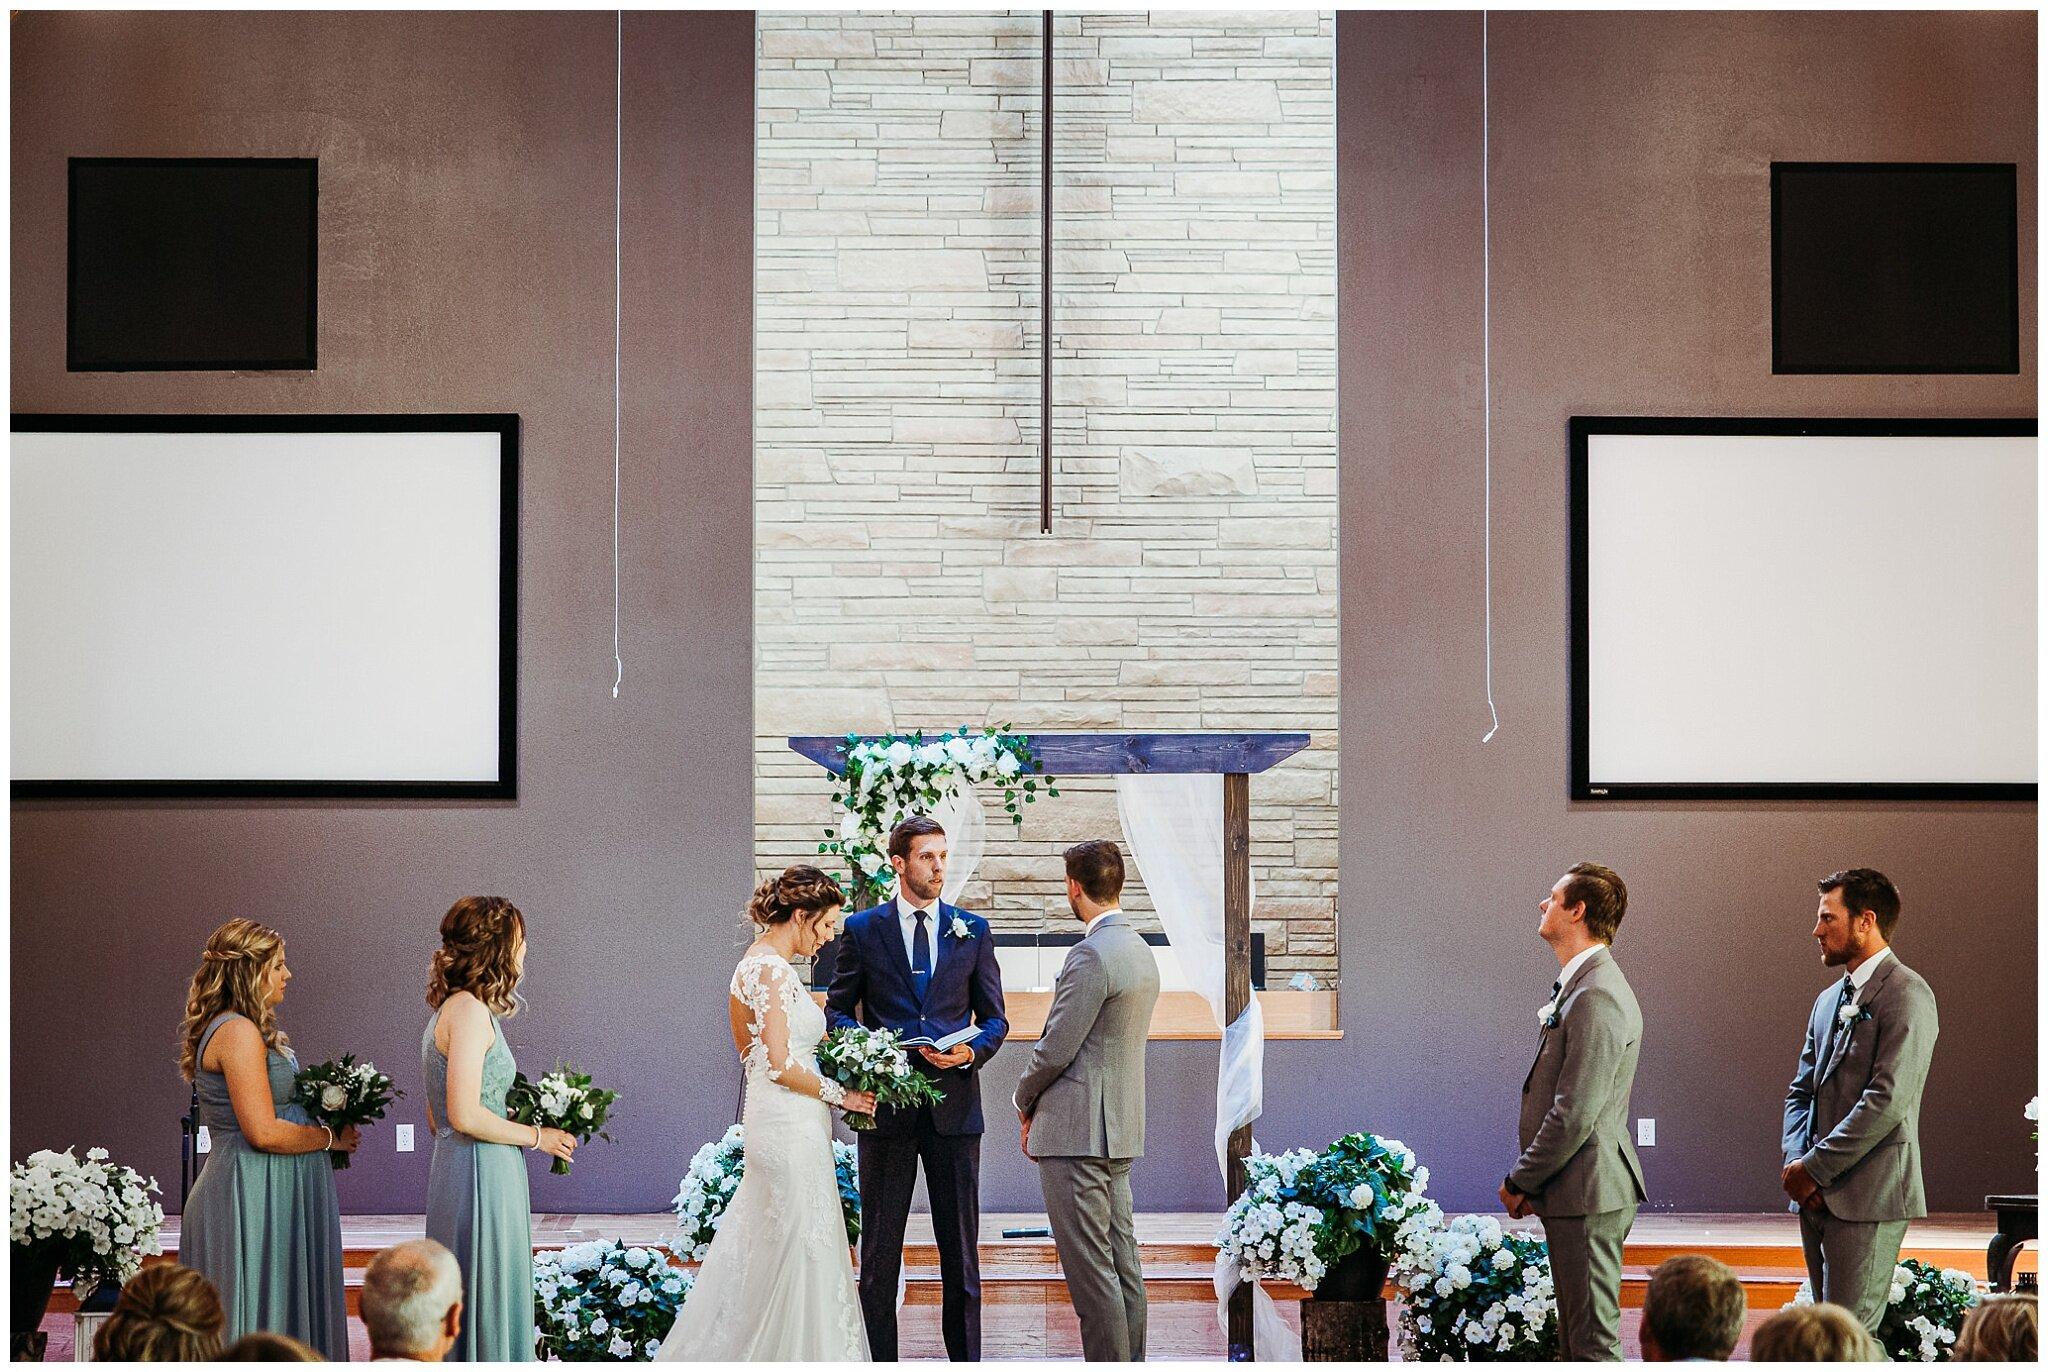 Eighteen Pastures Mission  BC Abbotsford BC Christian Wedding Photographer Summer Bride Groom Inspo_0011.jpg